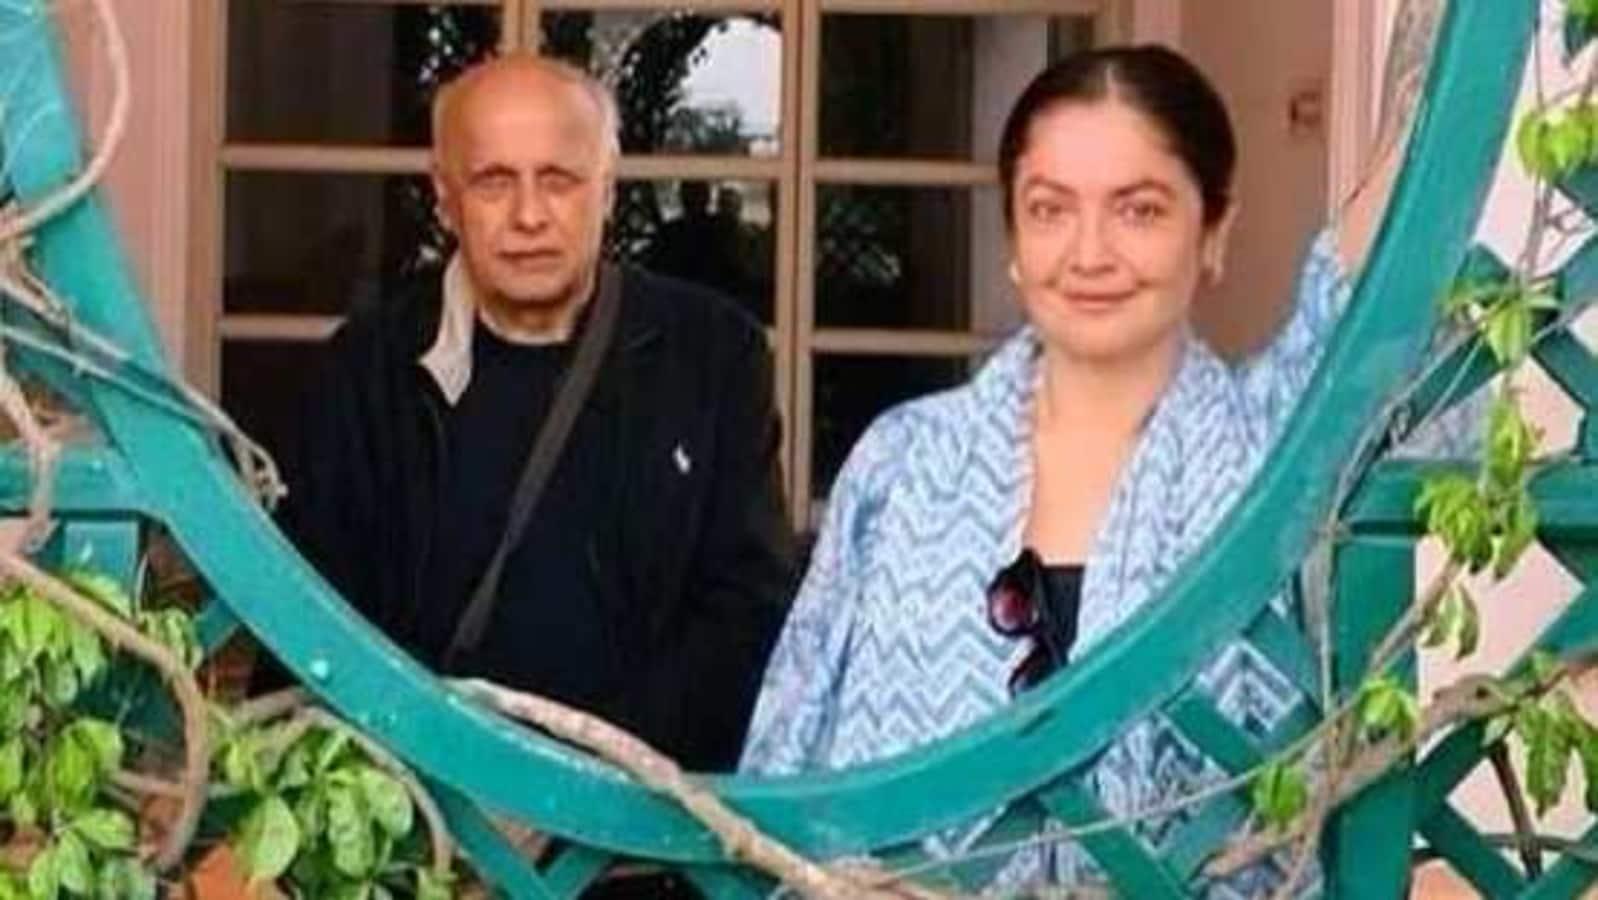 How Pooja Bhatt hated and then accepted Mahesh Bhatt's second wife Soni Razdan - Hindustan Times